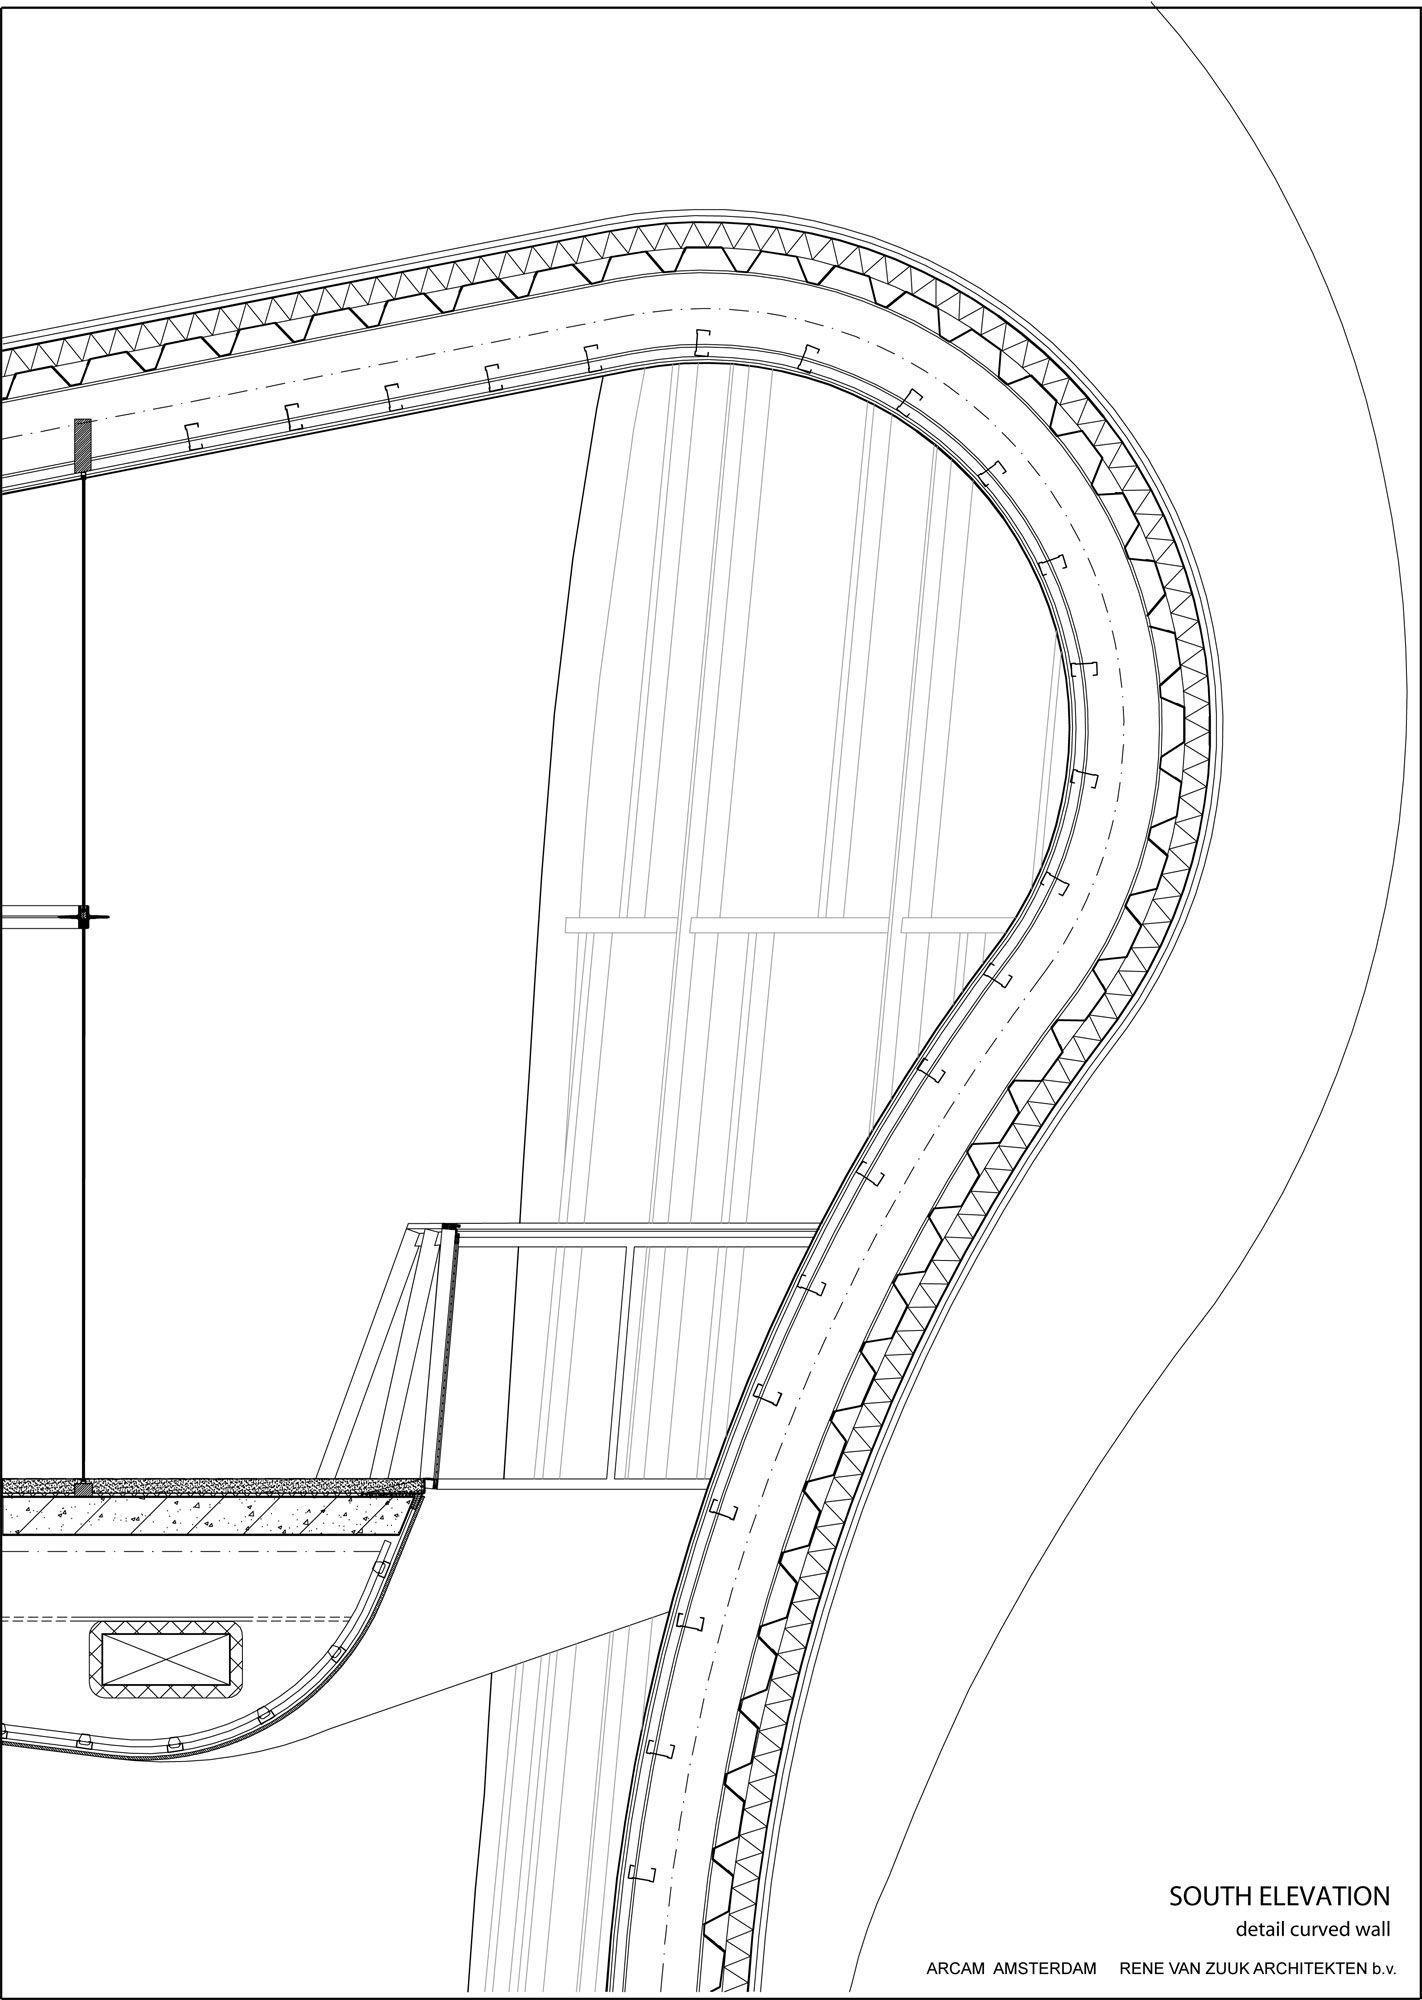 Arcam Rene Van Zuuk Architekten Curved Walls Roof Detail Construction Drawings